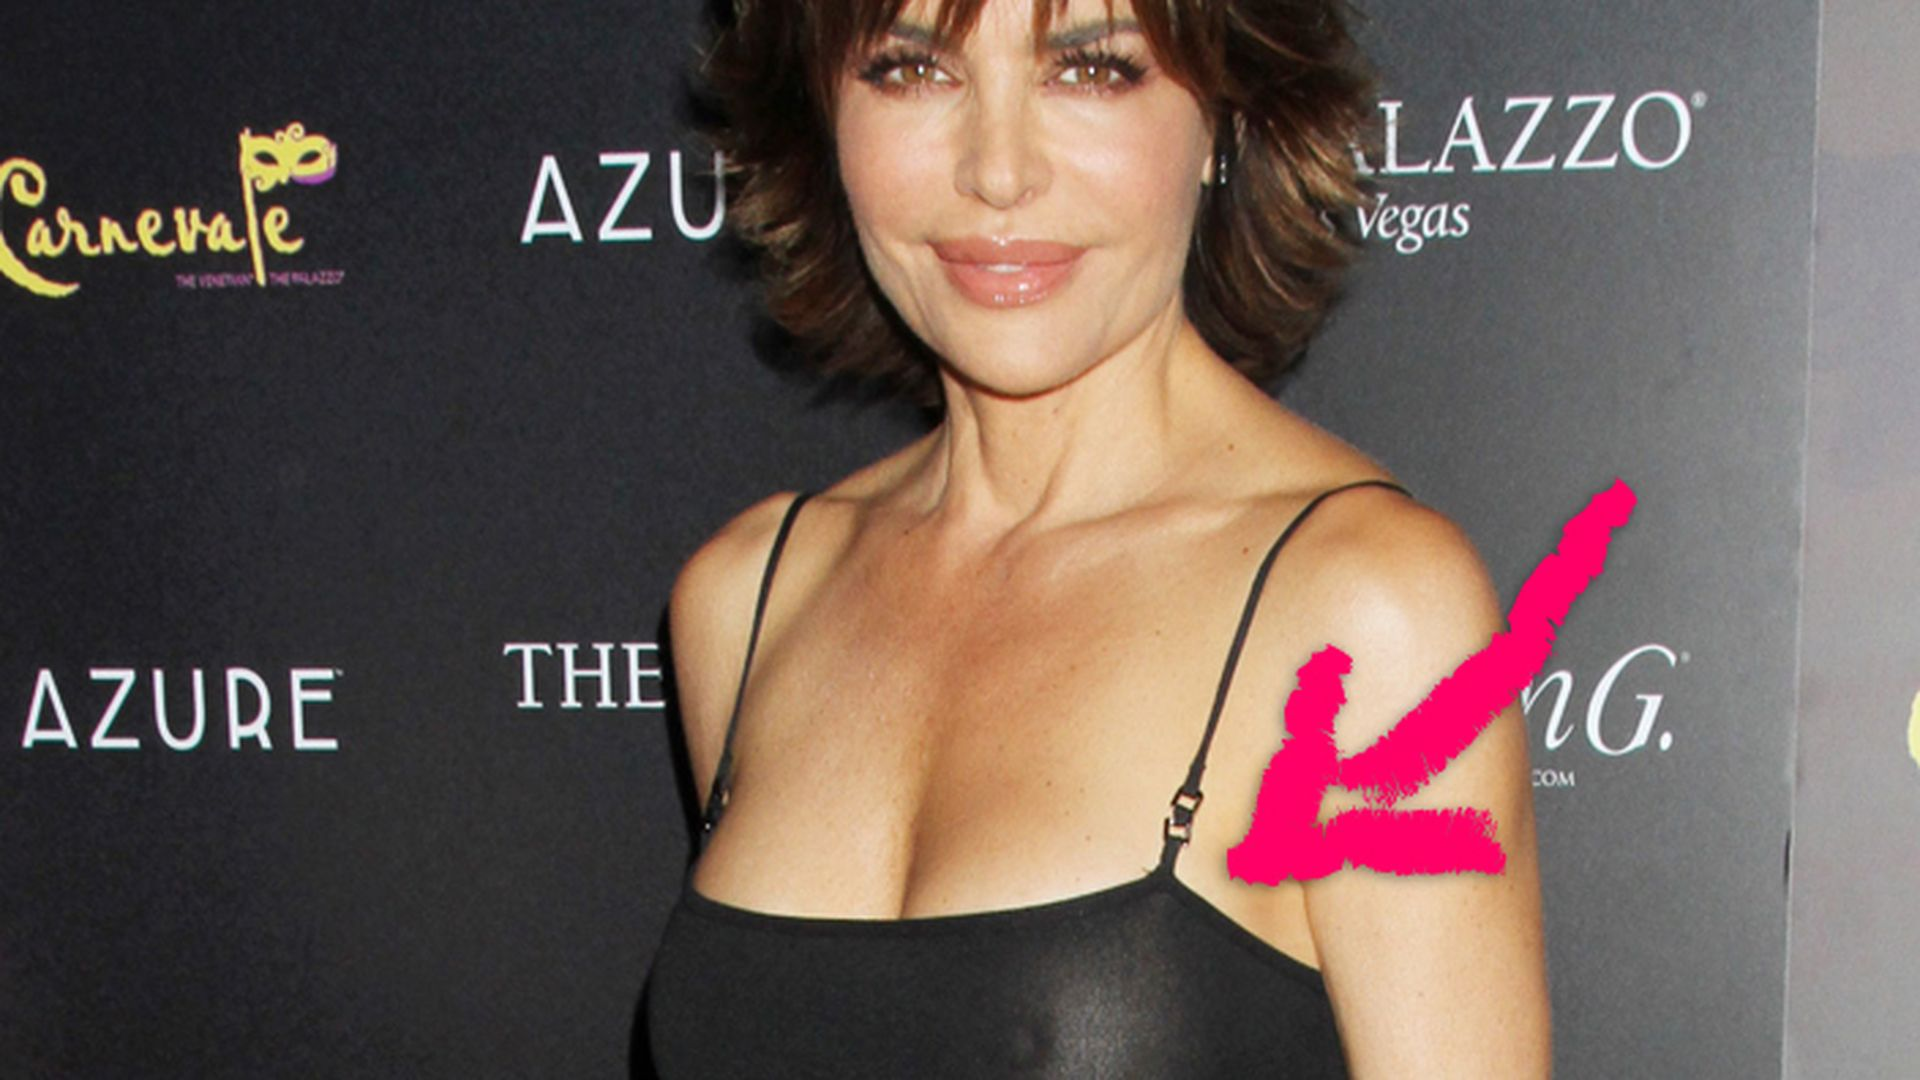 Gina-Lisa Lohfink nackt im Playboy: Das Video zum Shooting